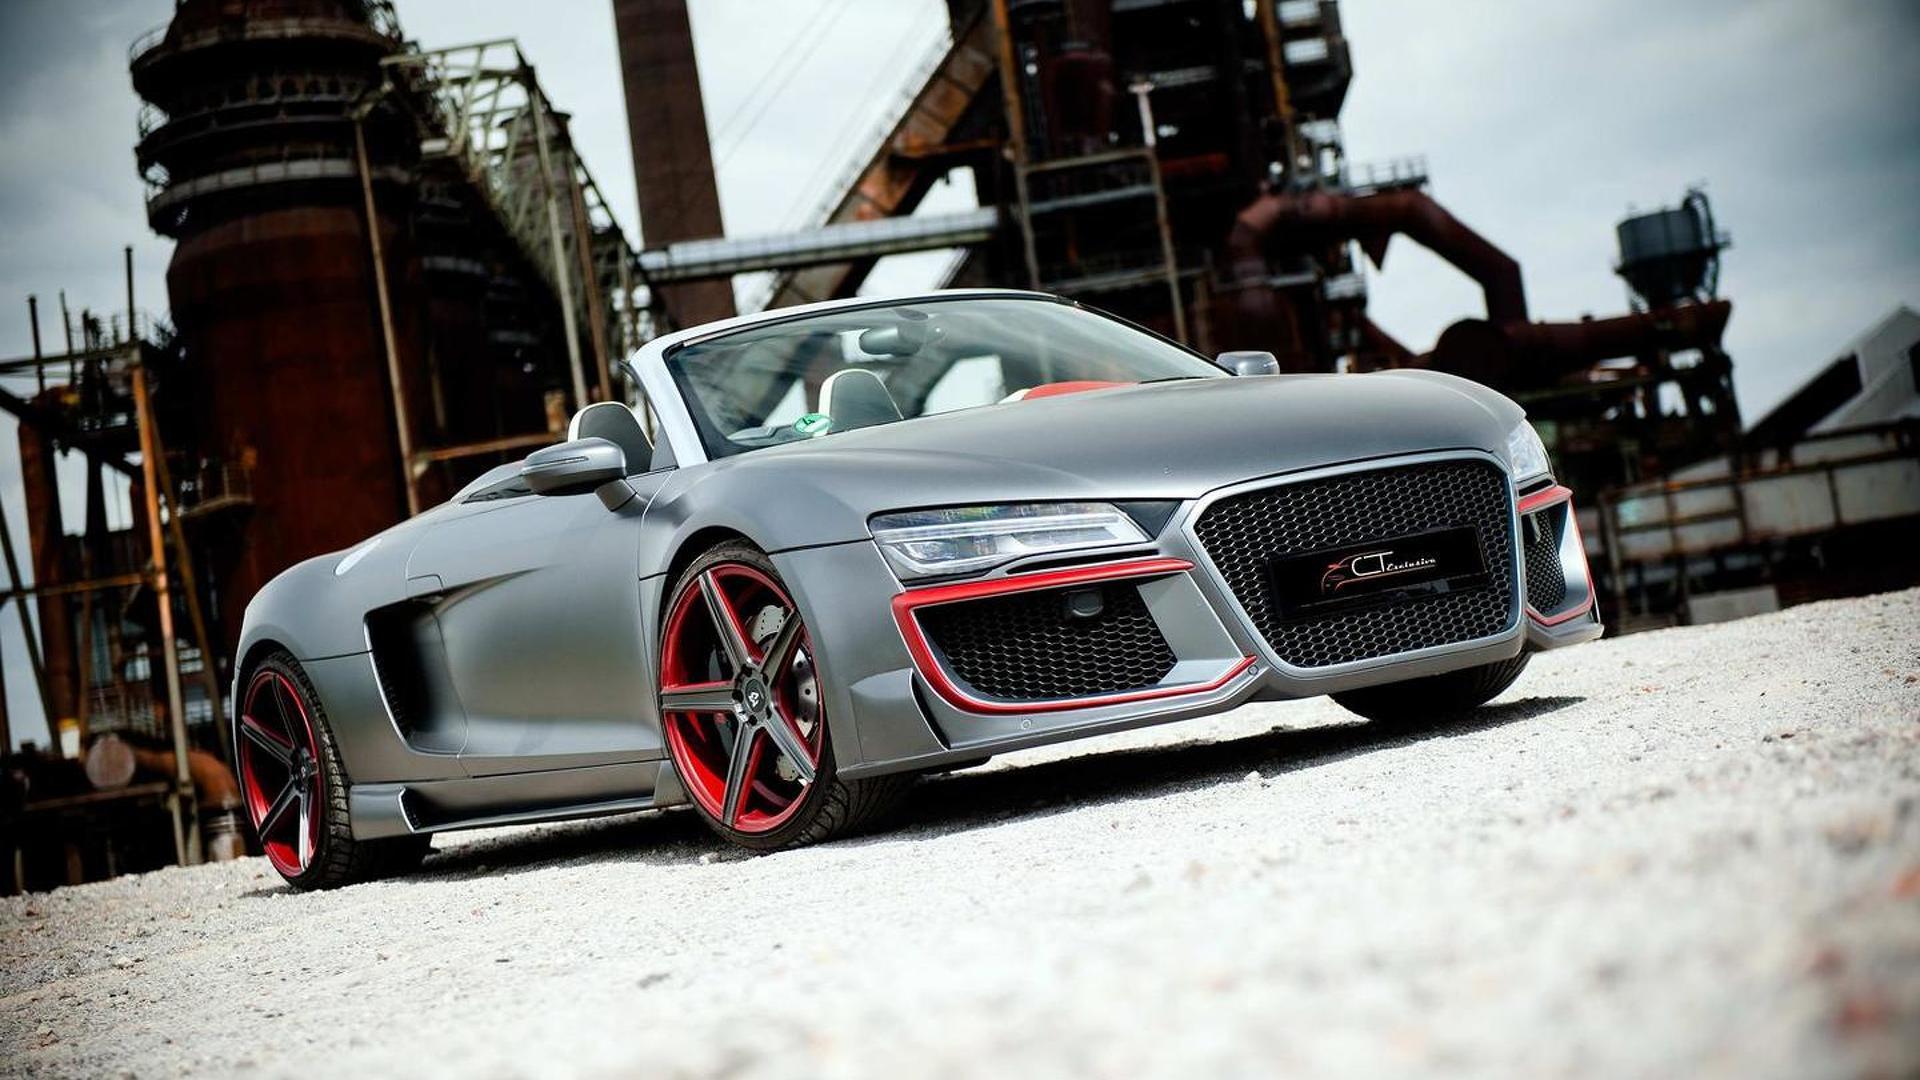 Тюнинг Audi R8 Spyder от CT Exclusive